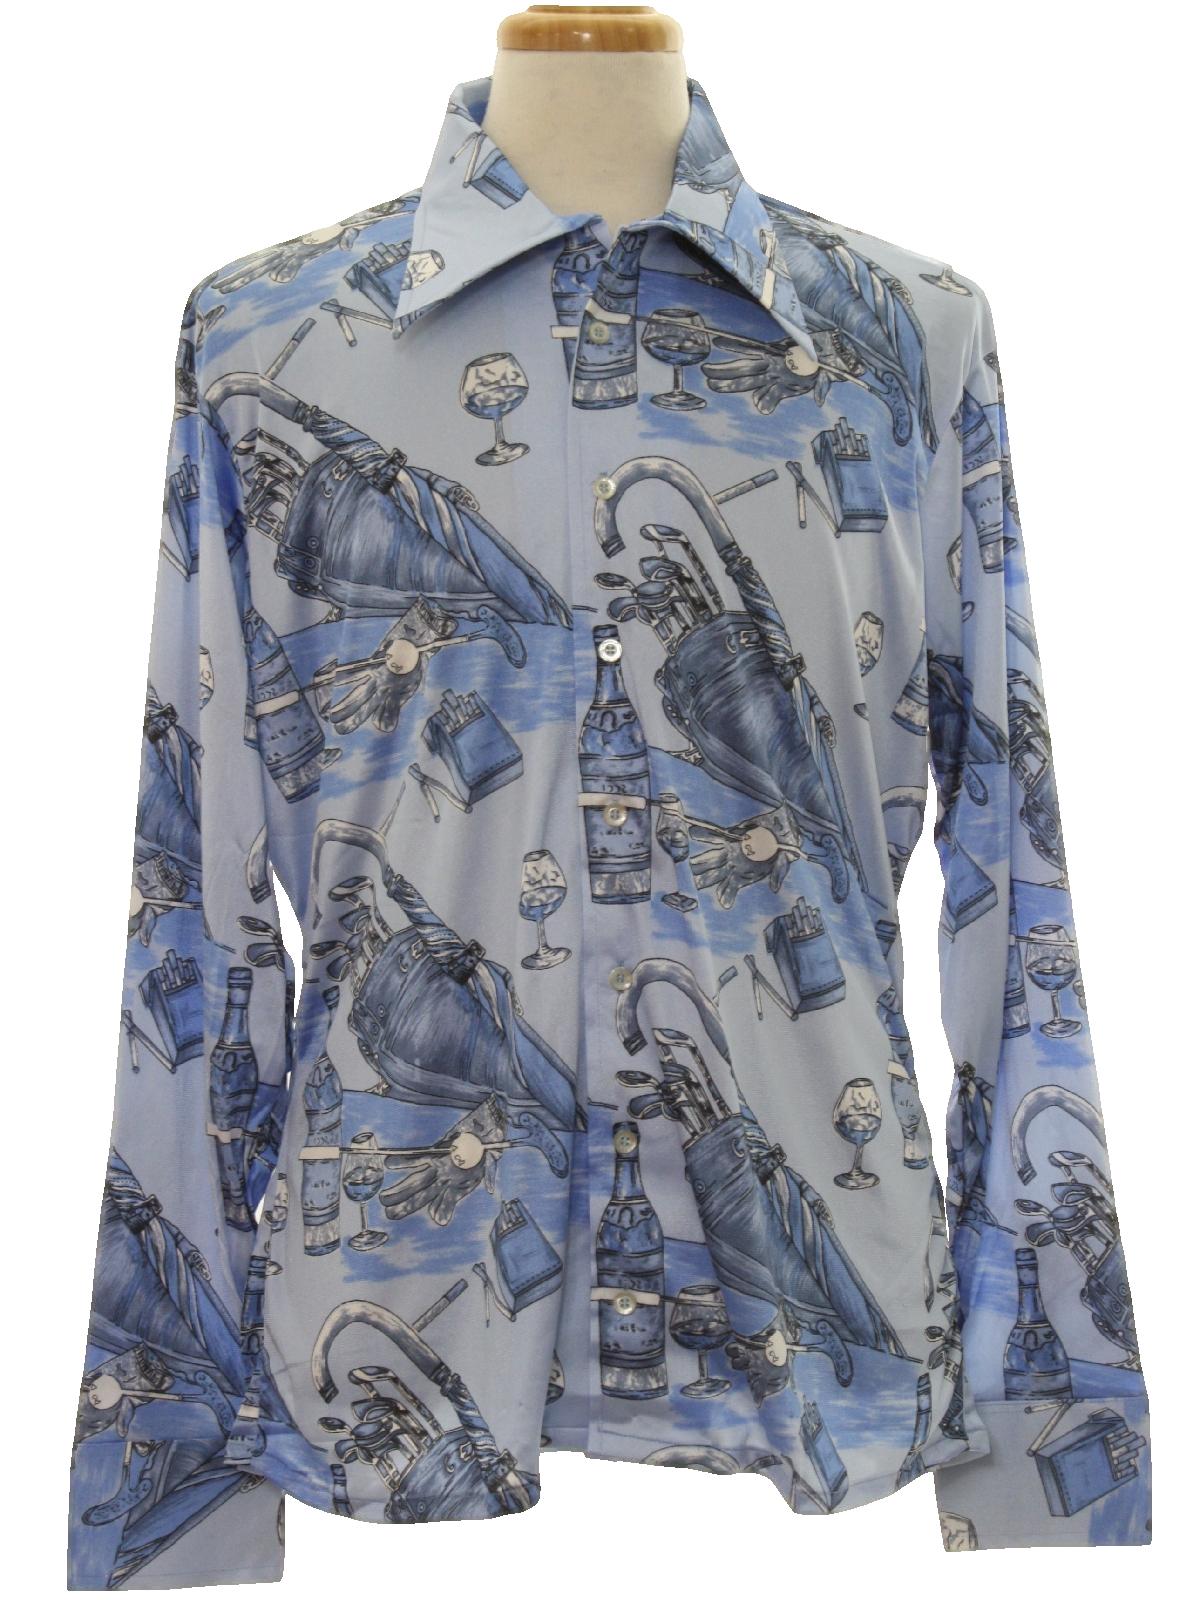 Vintage 1970s Print Disco Shirt 70s Oleg Cassini By